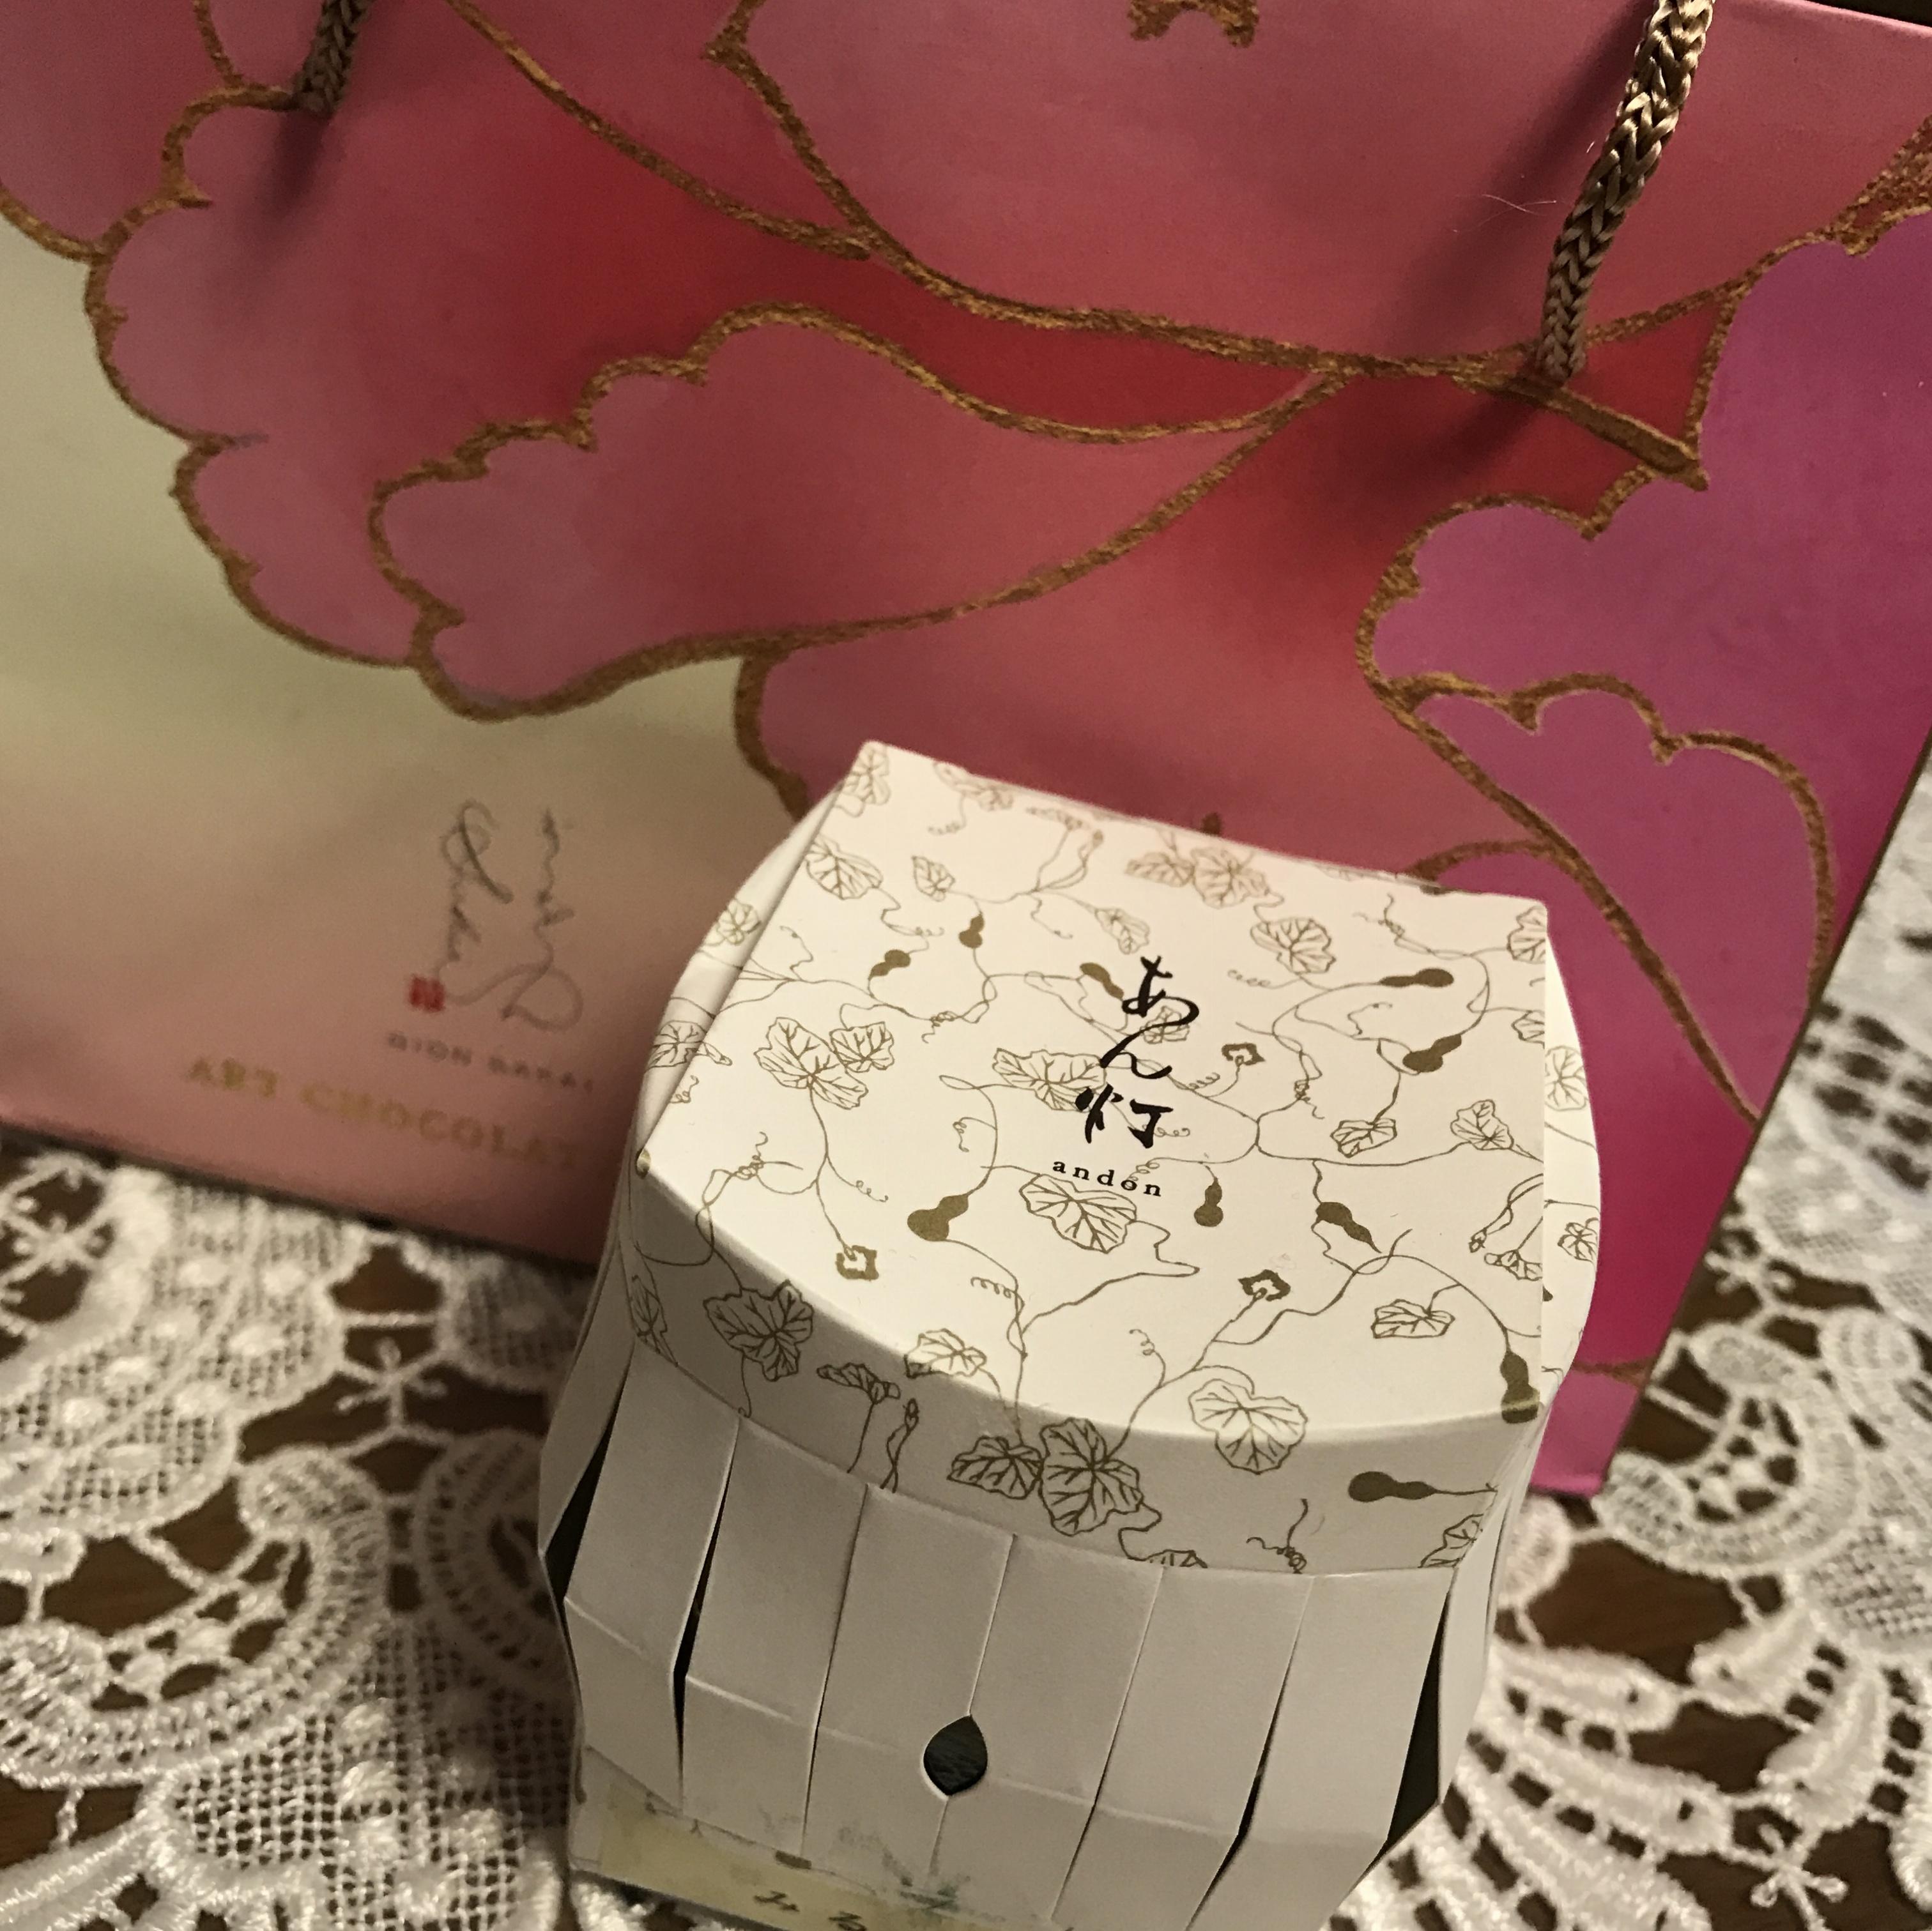 【cafe time】あんことみるくの出会い!京都・祇園 ぎをんさかいのあん灯のおいしさは格別☆_2